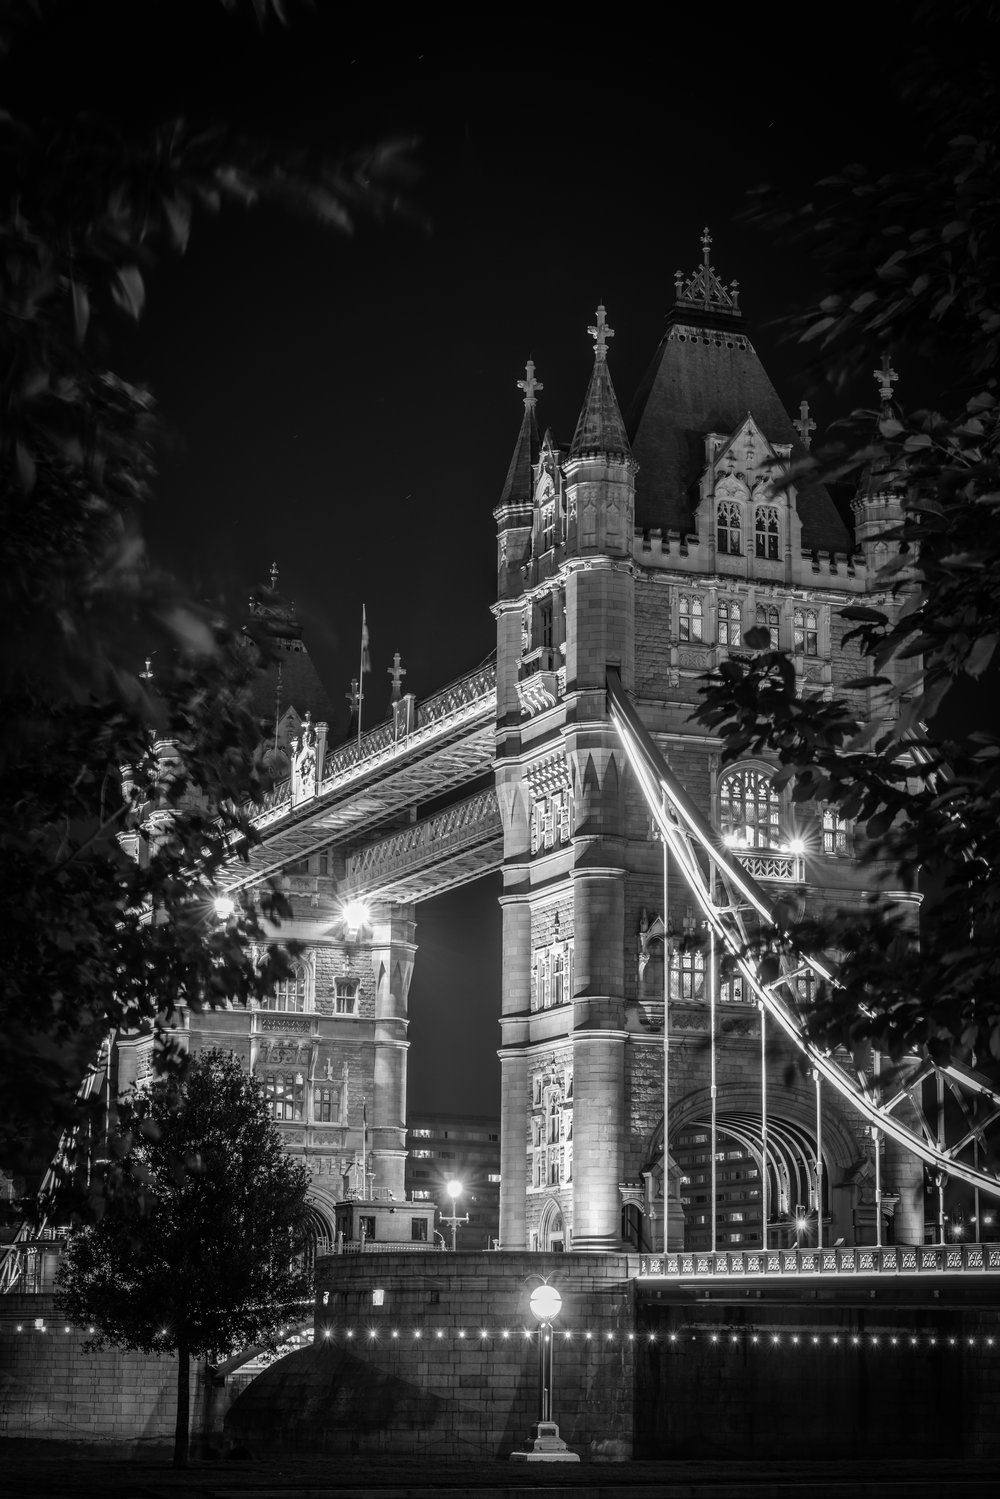 -Lighting Up Tower Bridge-